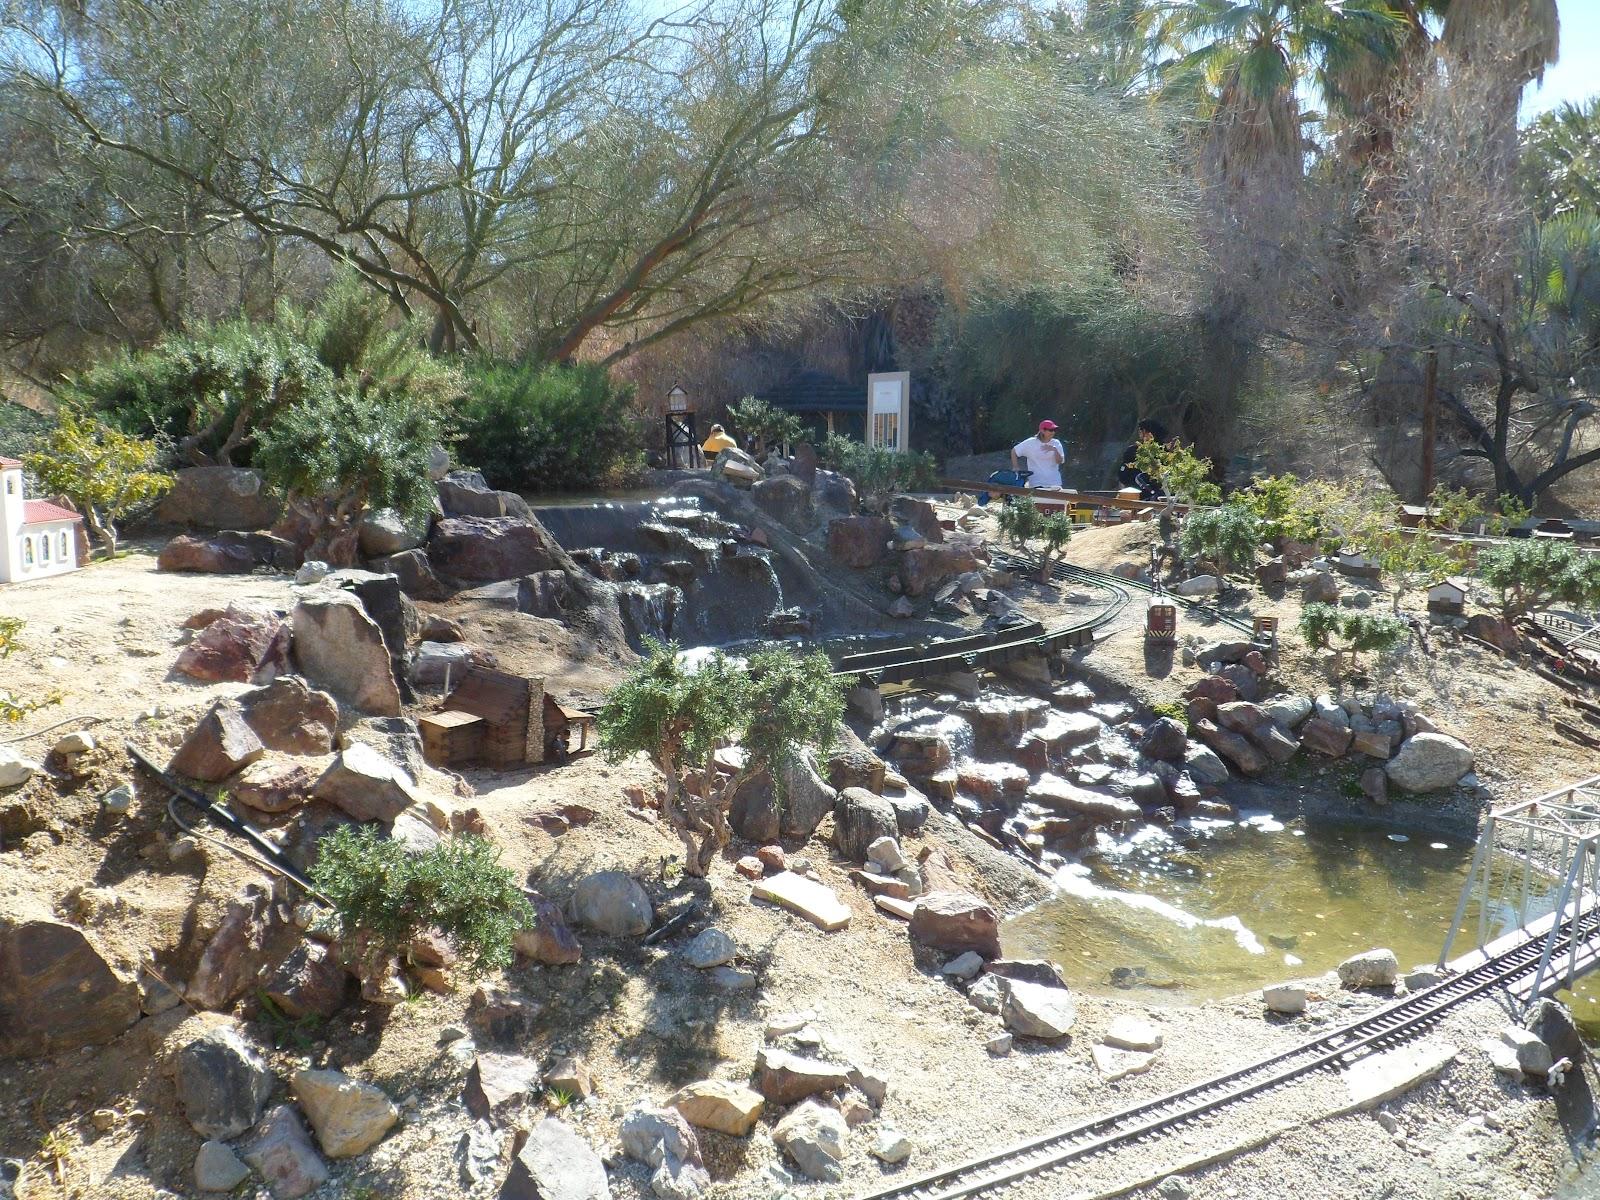 Rauhala Ramblers: Living Desert, Palm Springs part 3 ...